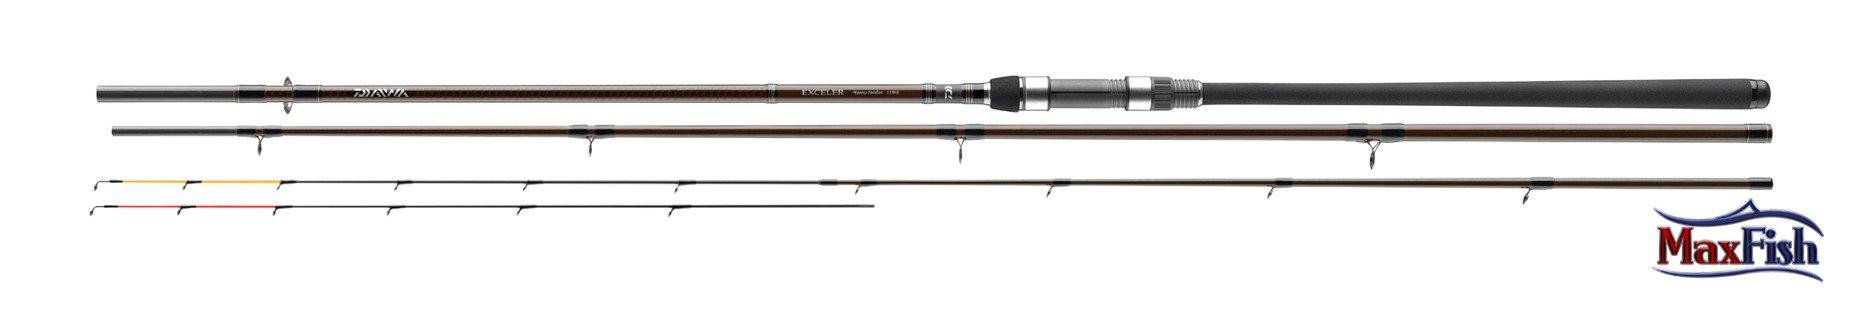 Daiwa Exceler Method Feeder  390cm 80g